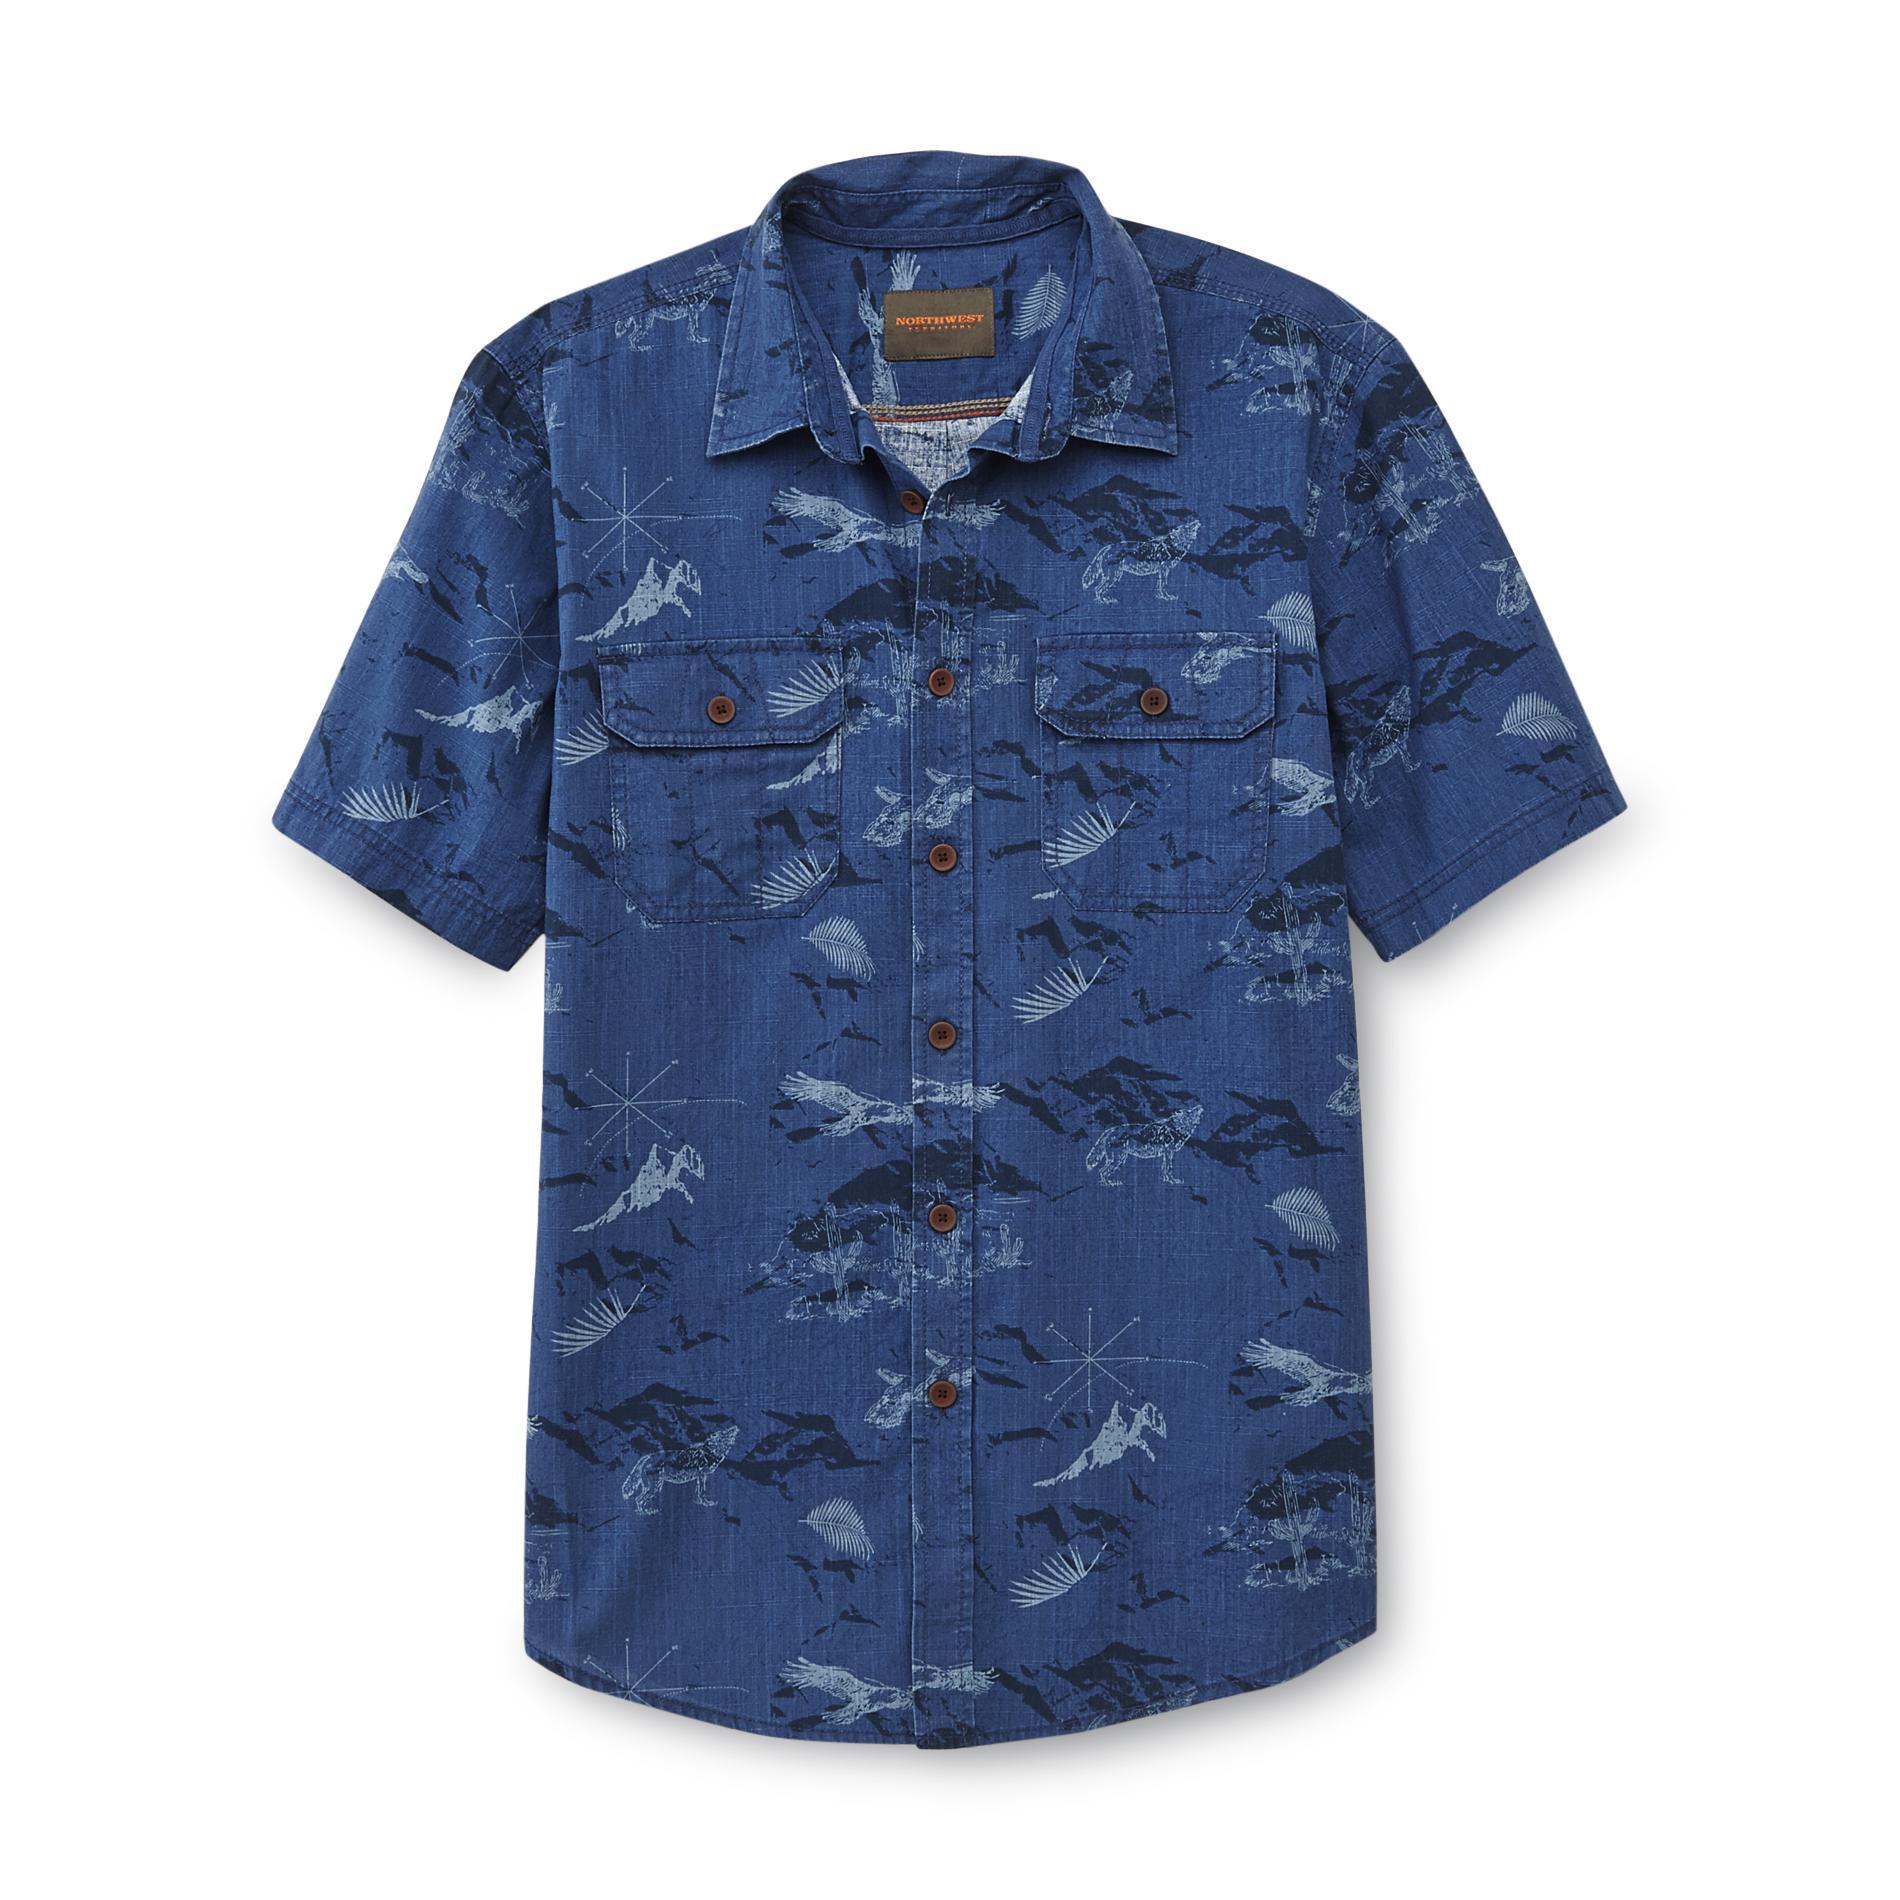 Northwest Teritory Men's 1-Piece Wildlife Print Cotton Button-Front Shirts